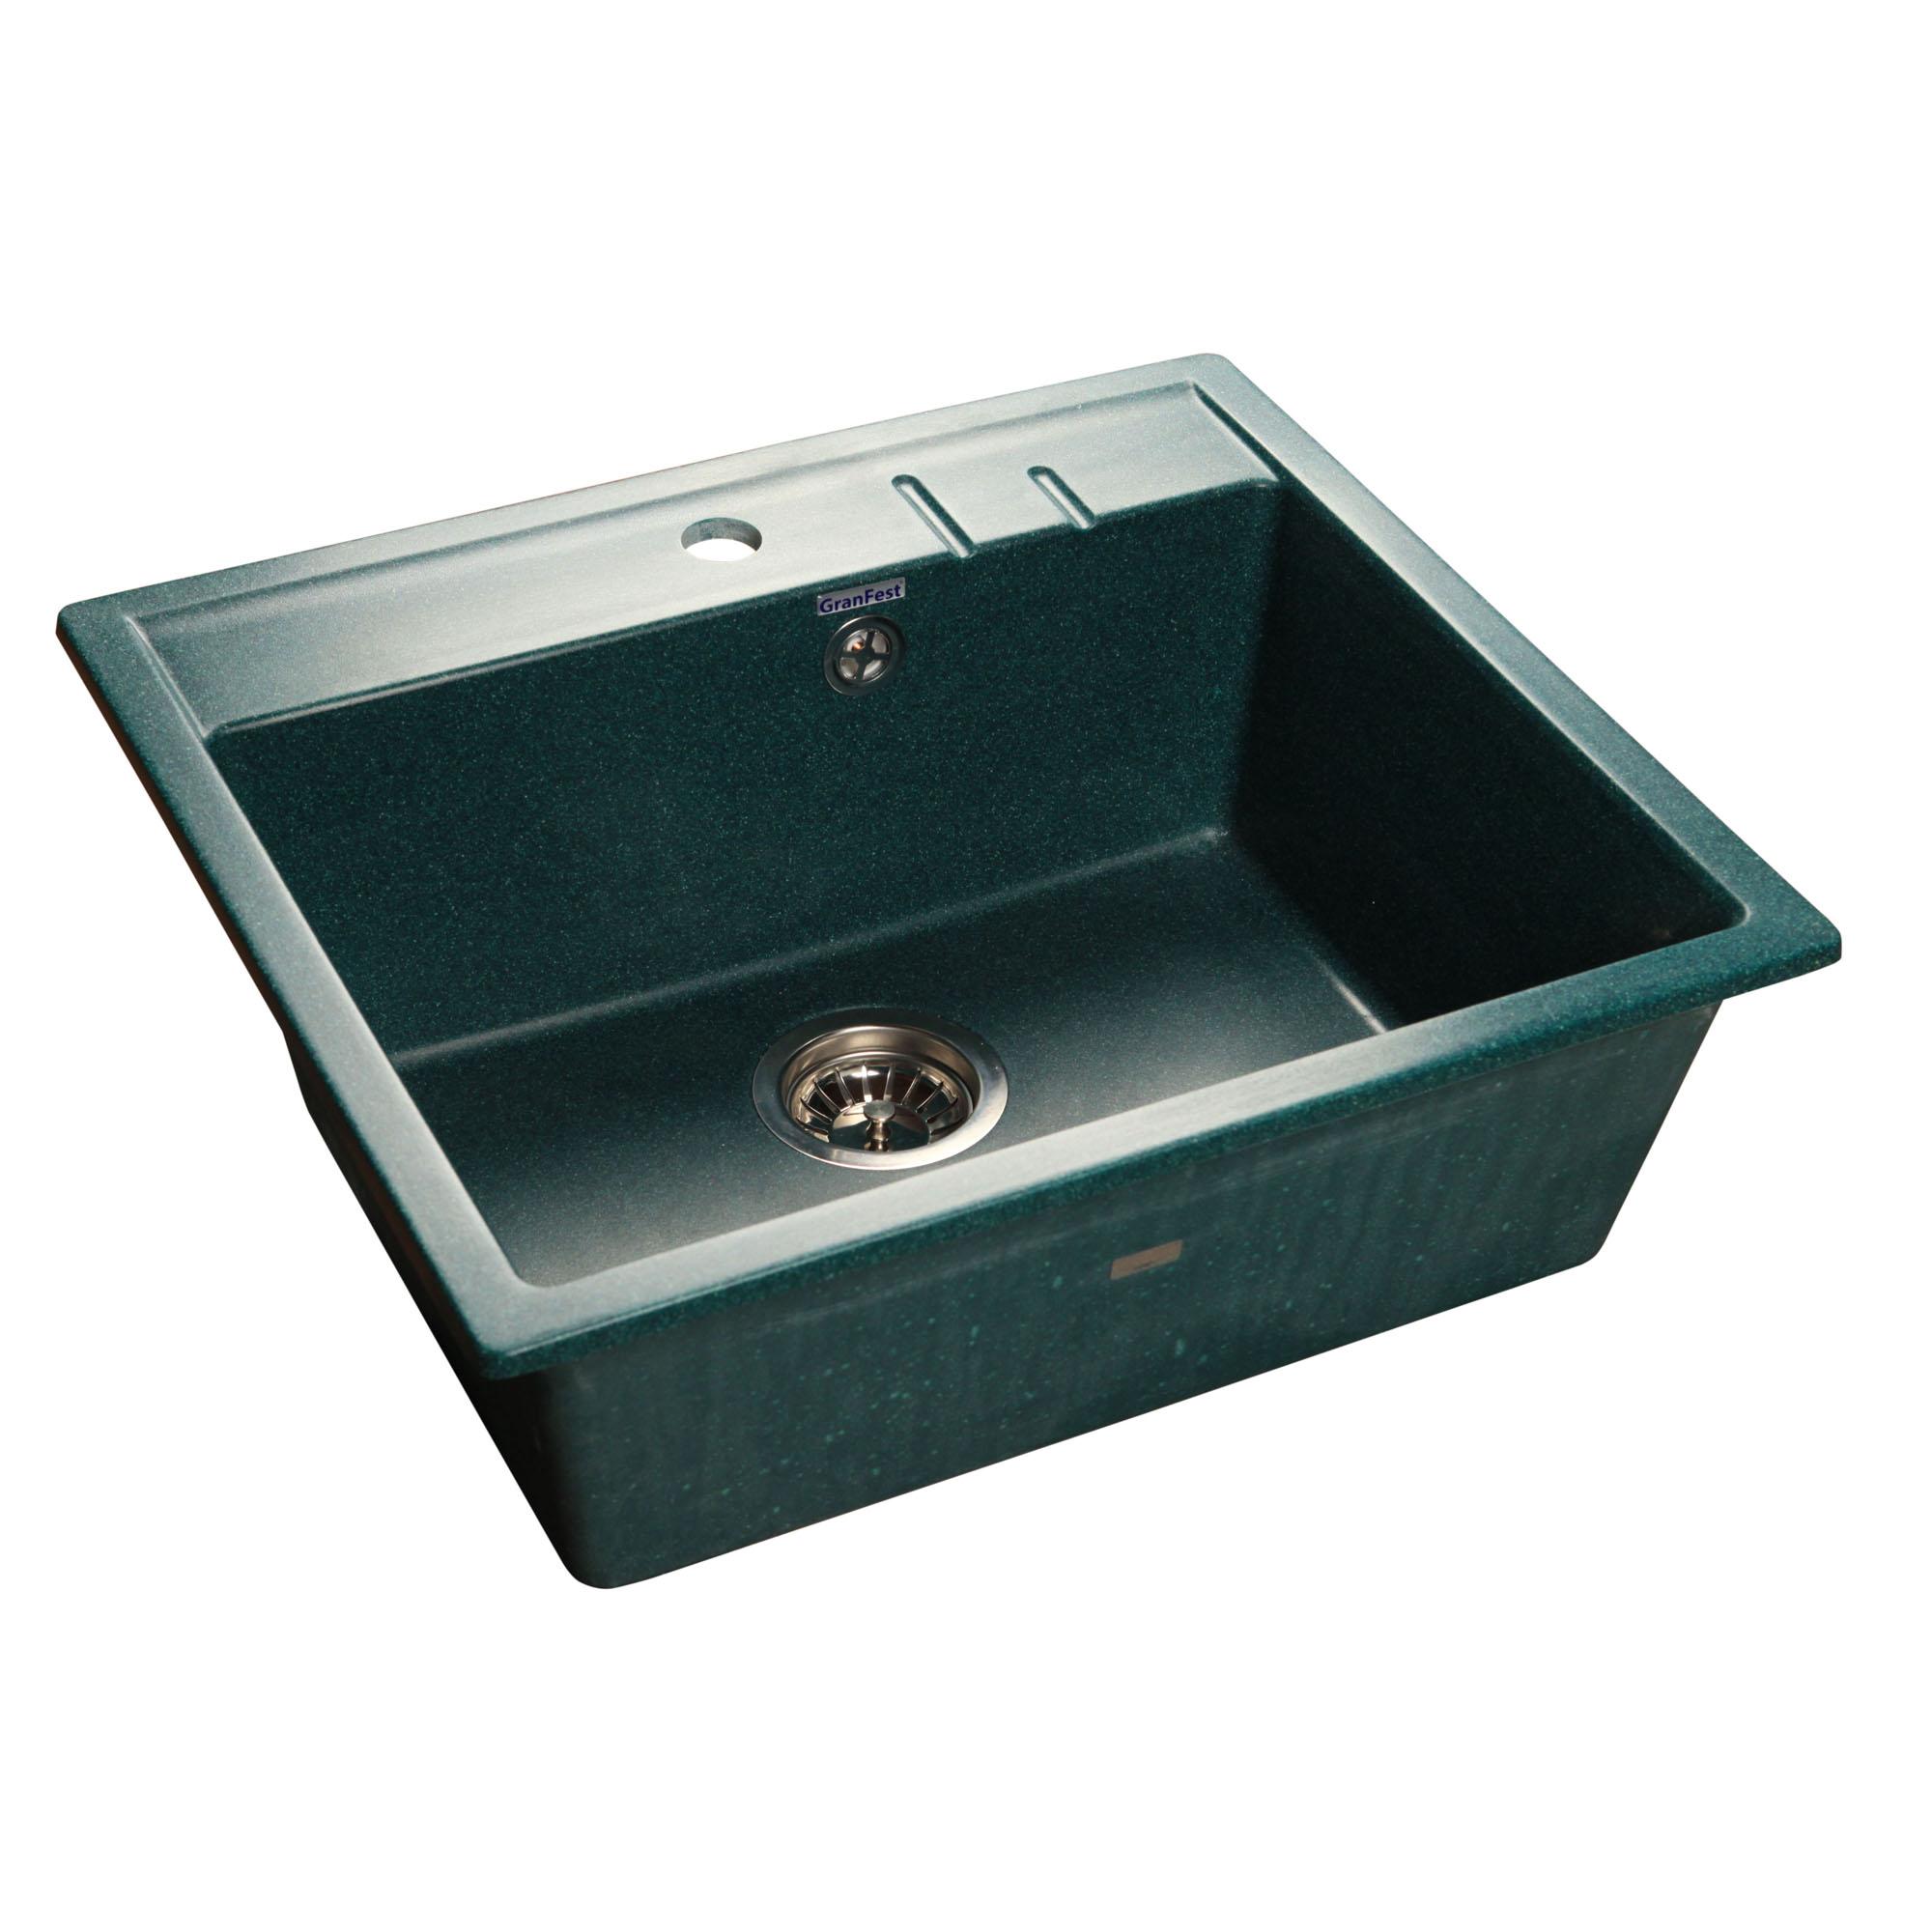 Кухонная мойка GranFest Quadro GF-Q560 зеленый мойка кухонная granfest гранит 565x510 gf q560 терракот